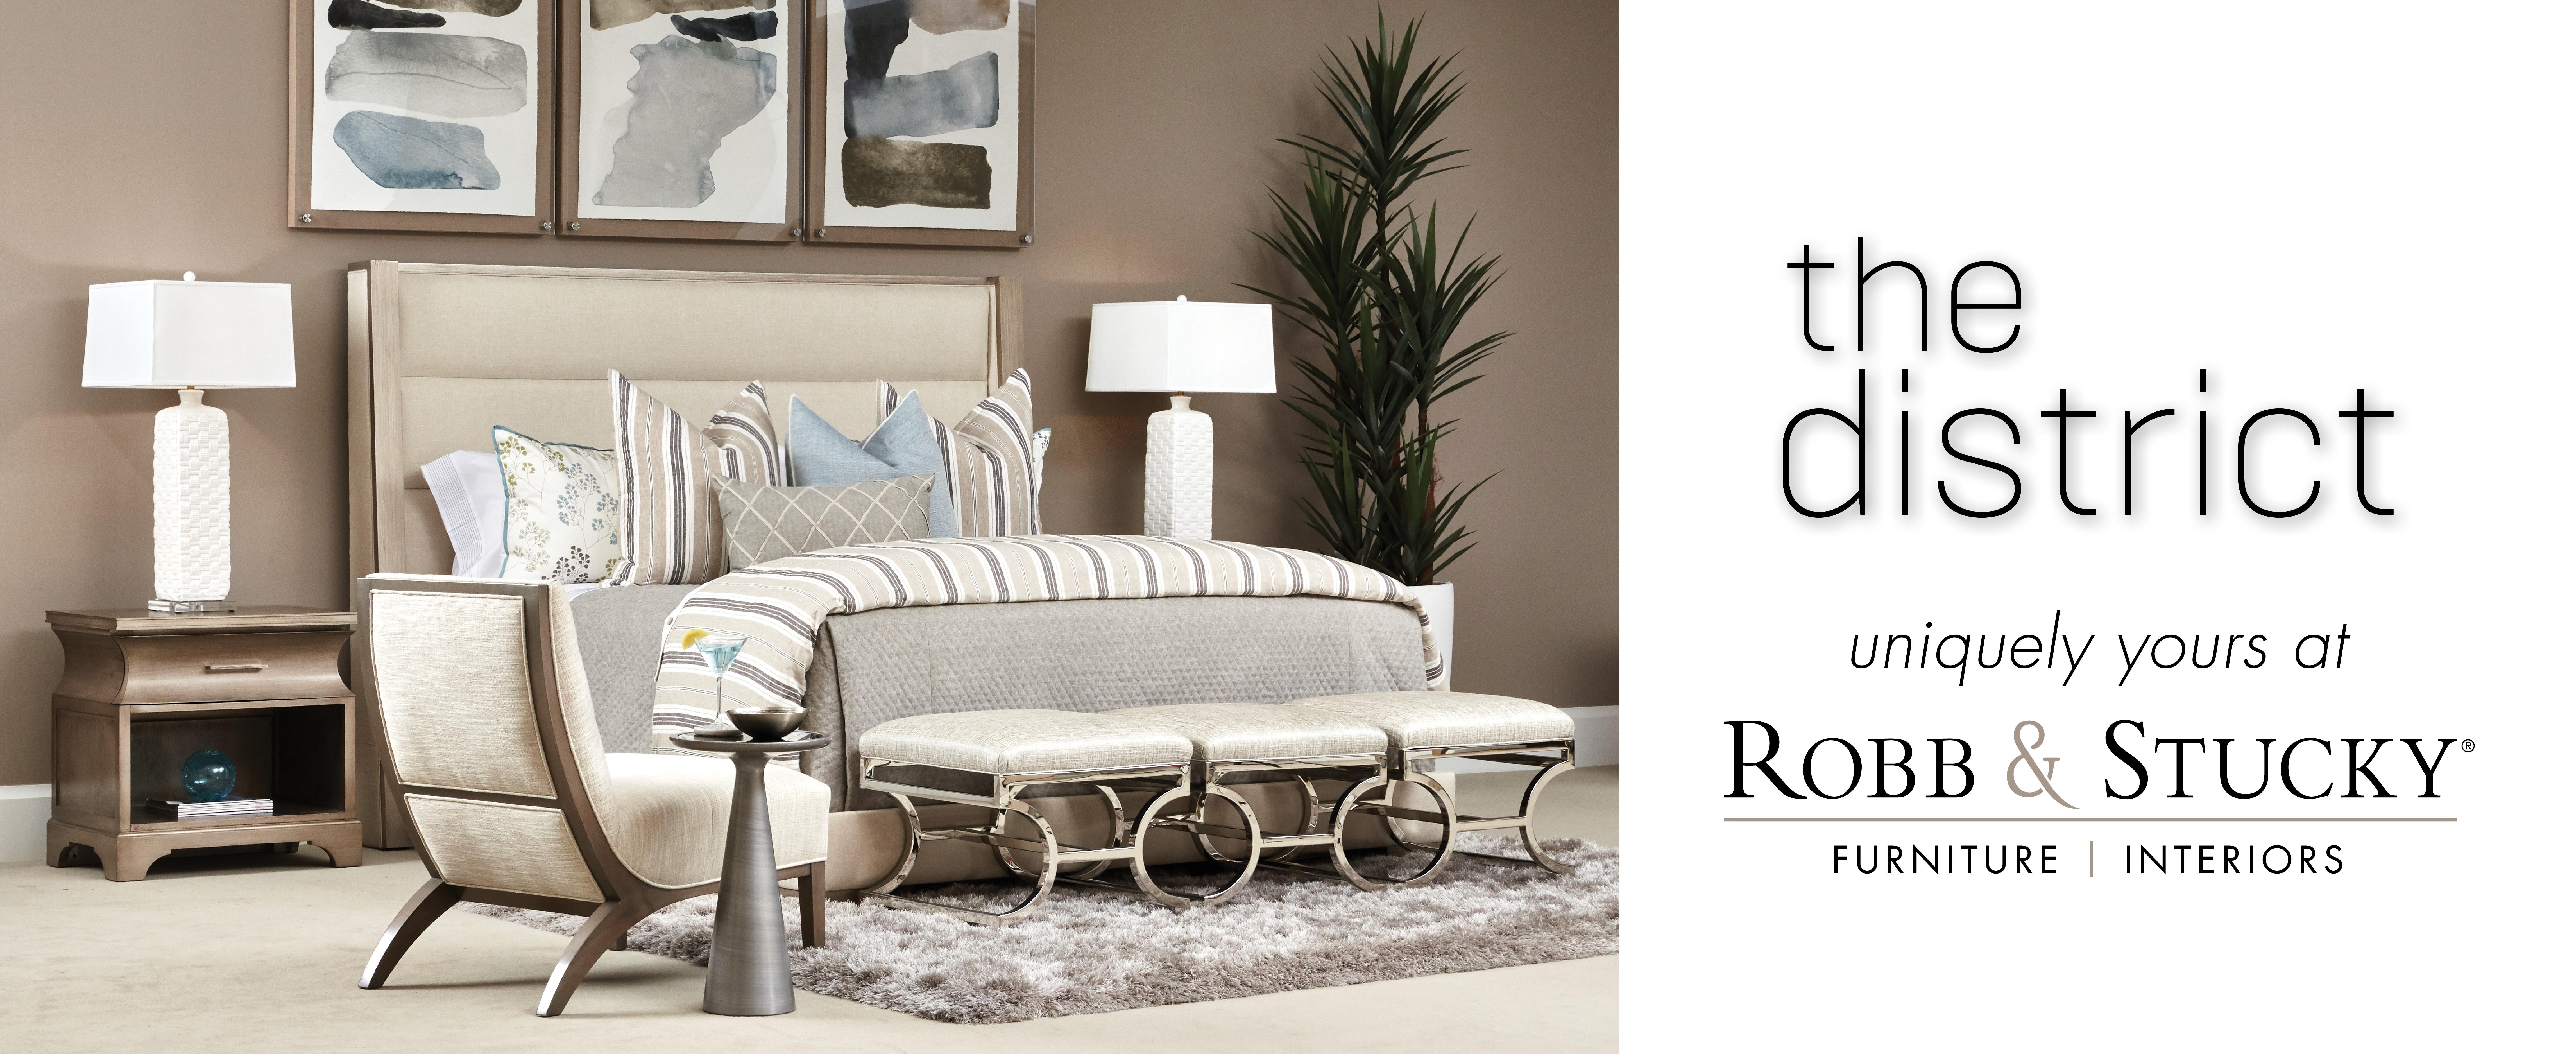 Furniture Interiors Florida Fort Myers Naples Sarasota C Gables Boca Raton Robb Stucky